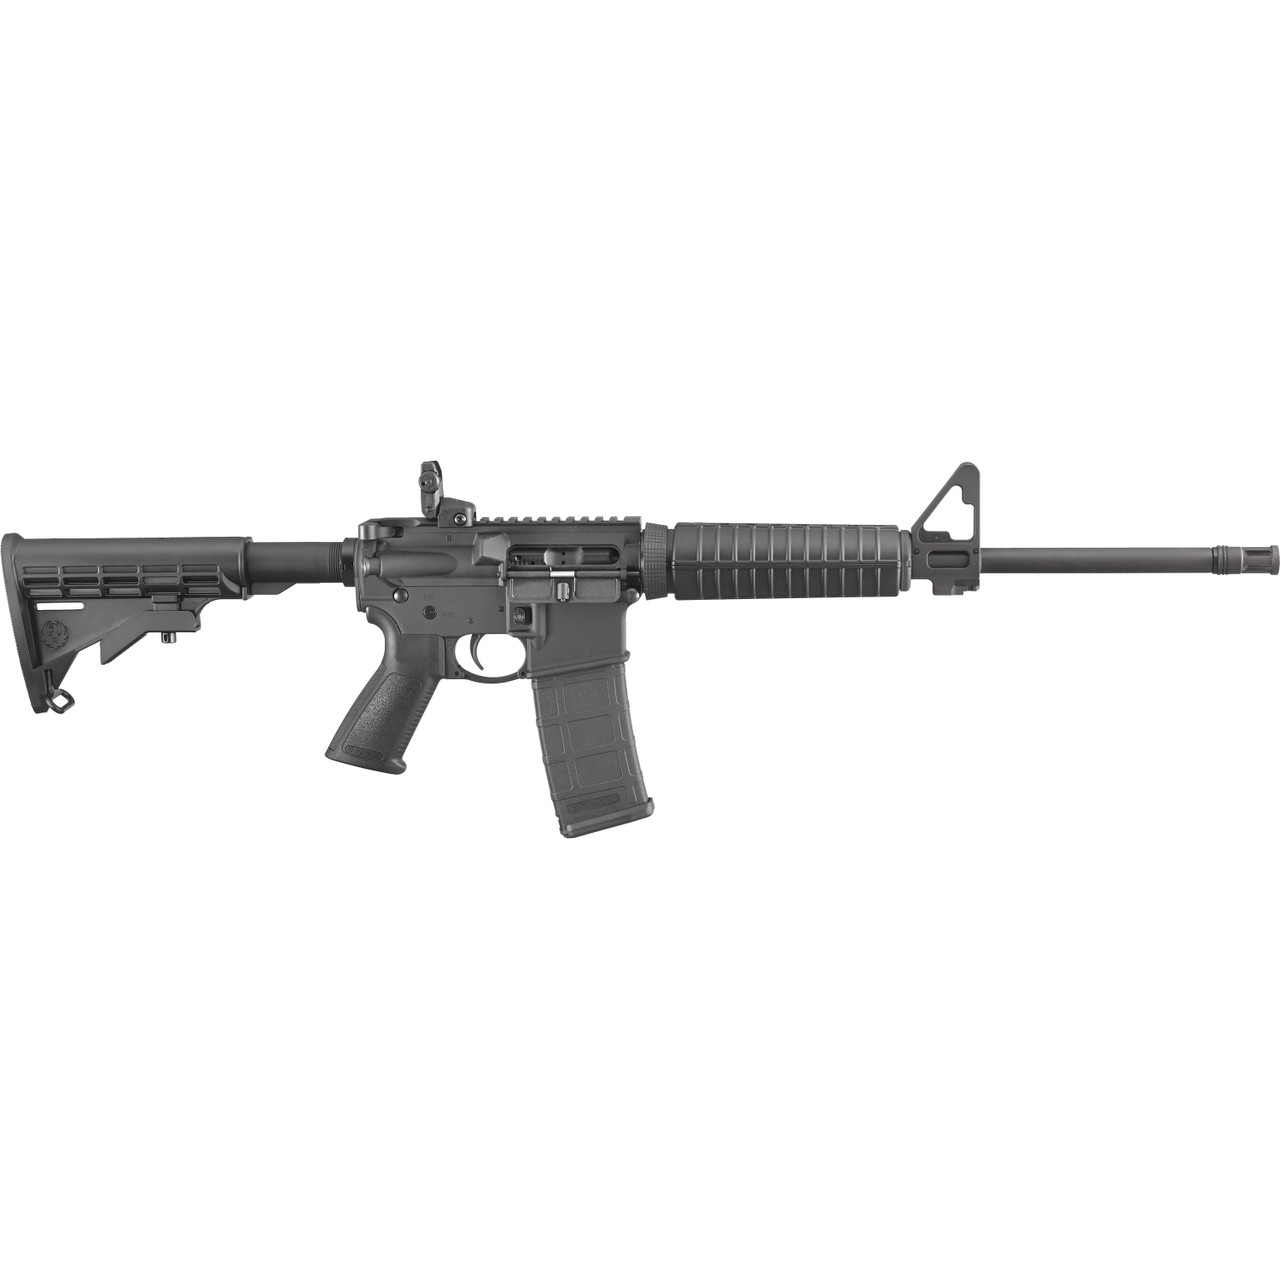 Ruger AR-556 CALIFORNIA LEGAL - .223/5.56